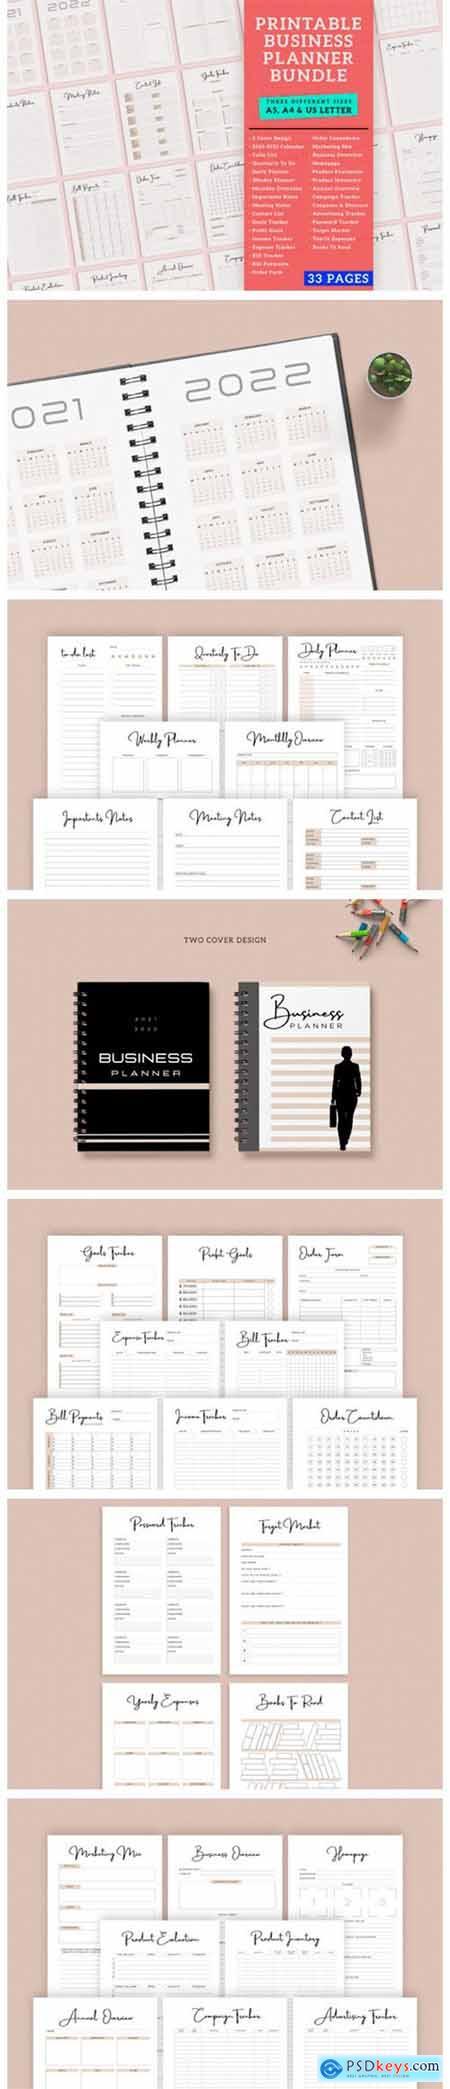 Business Finance Planner Printable 10707502